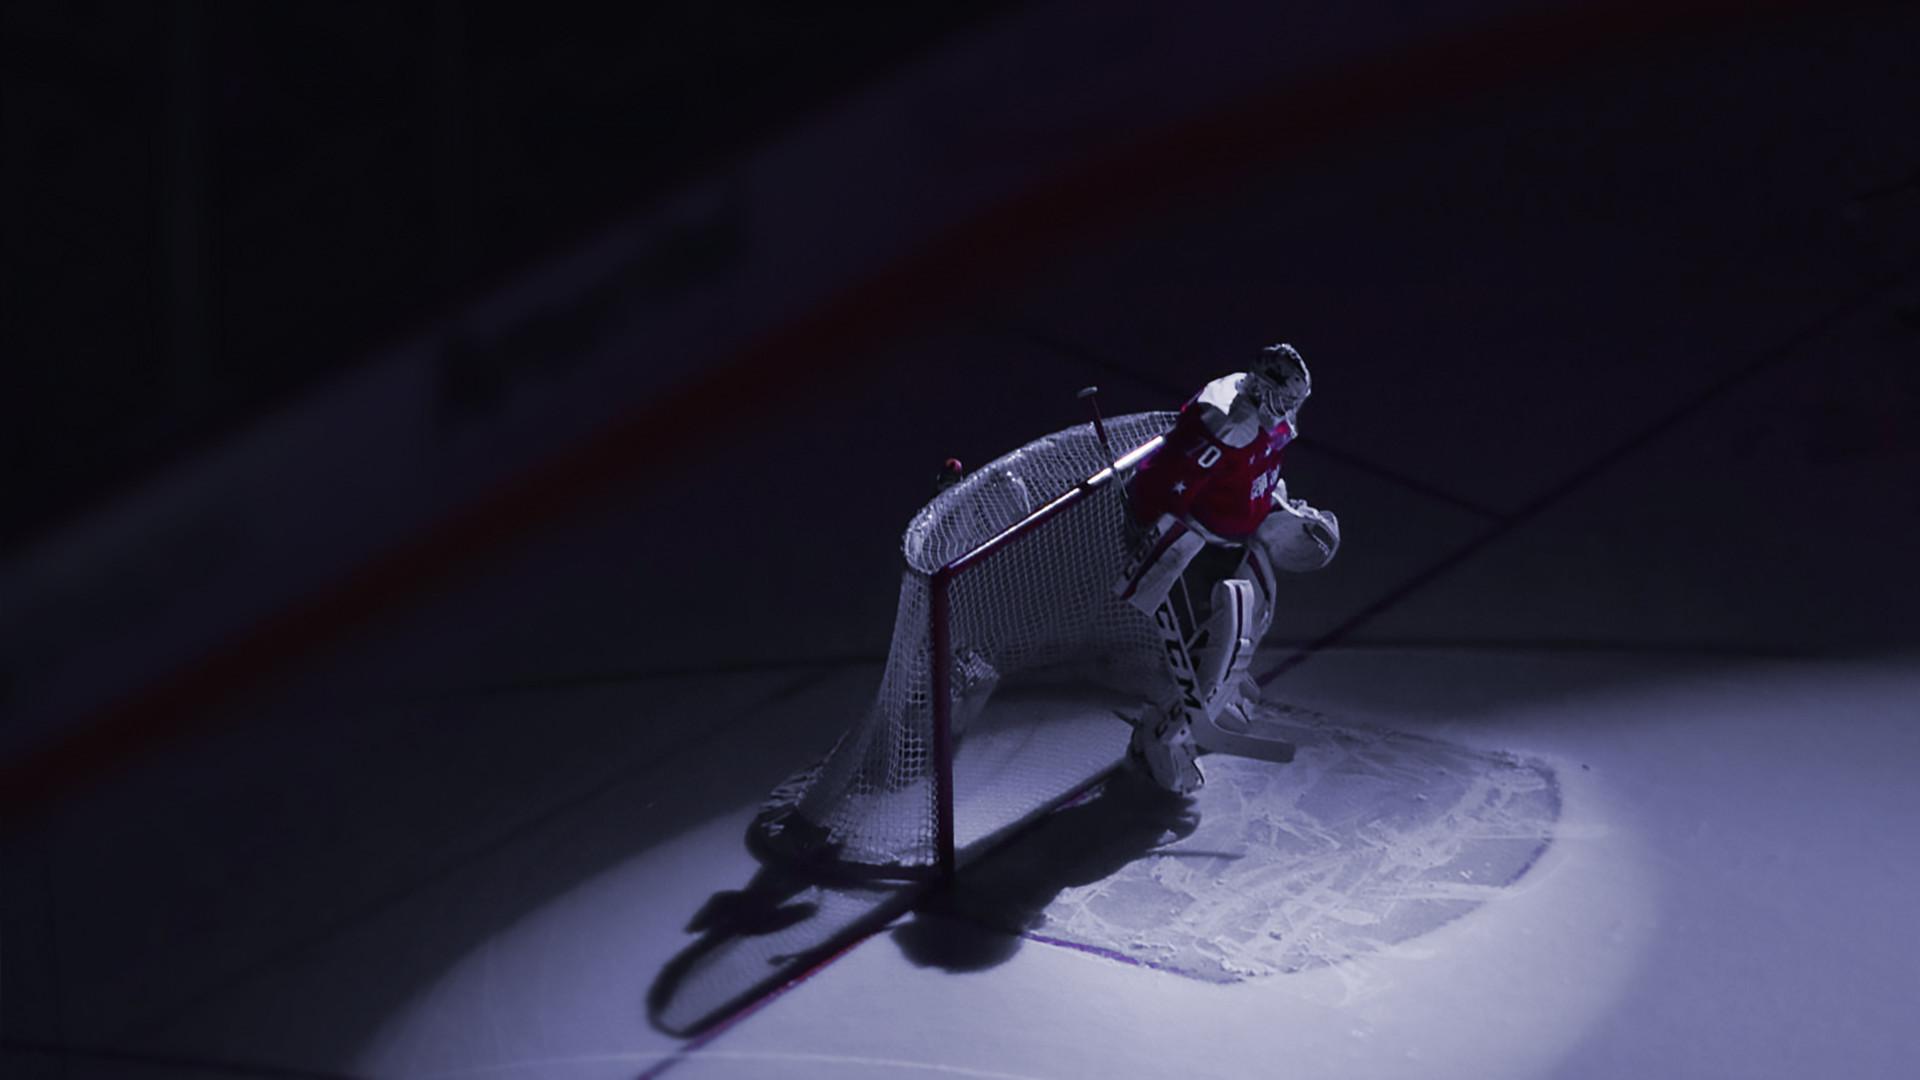 Hockey Analytics Startup Lands Washington Capitals as First NHL Team Client  – Techvibes